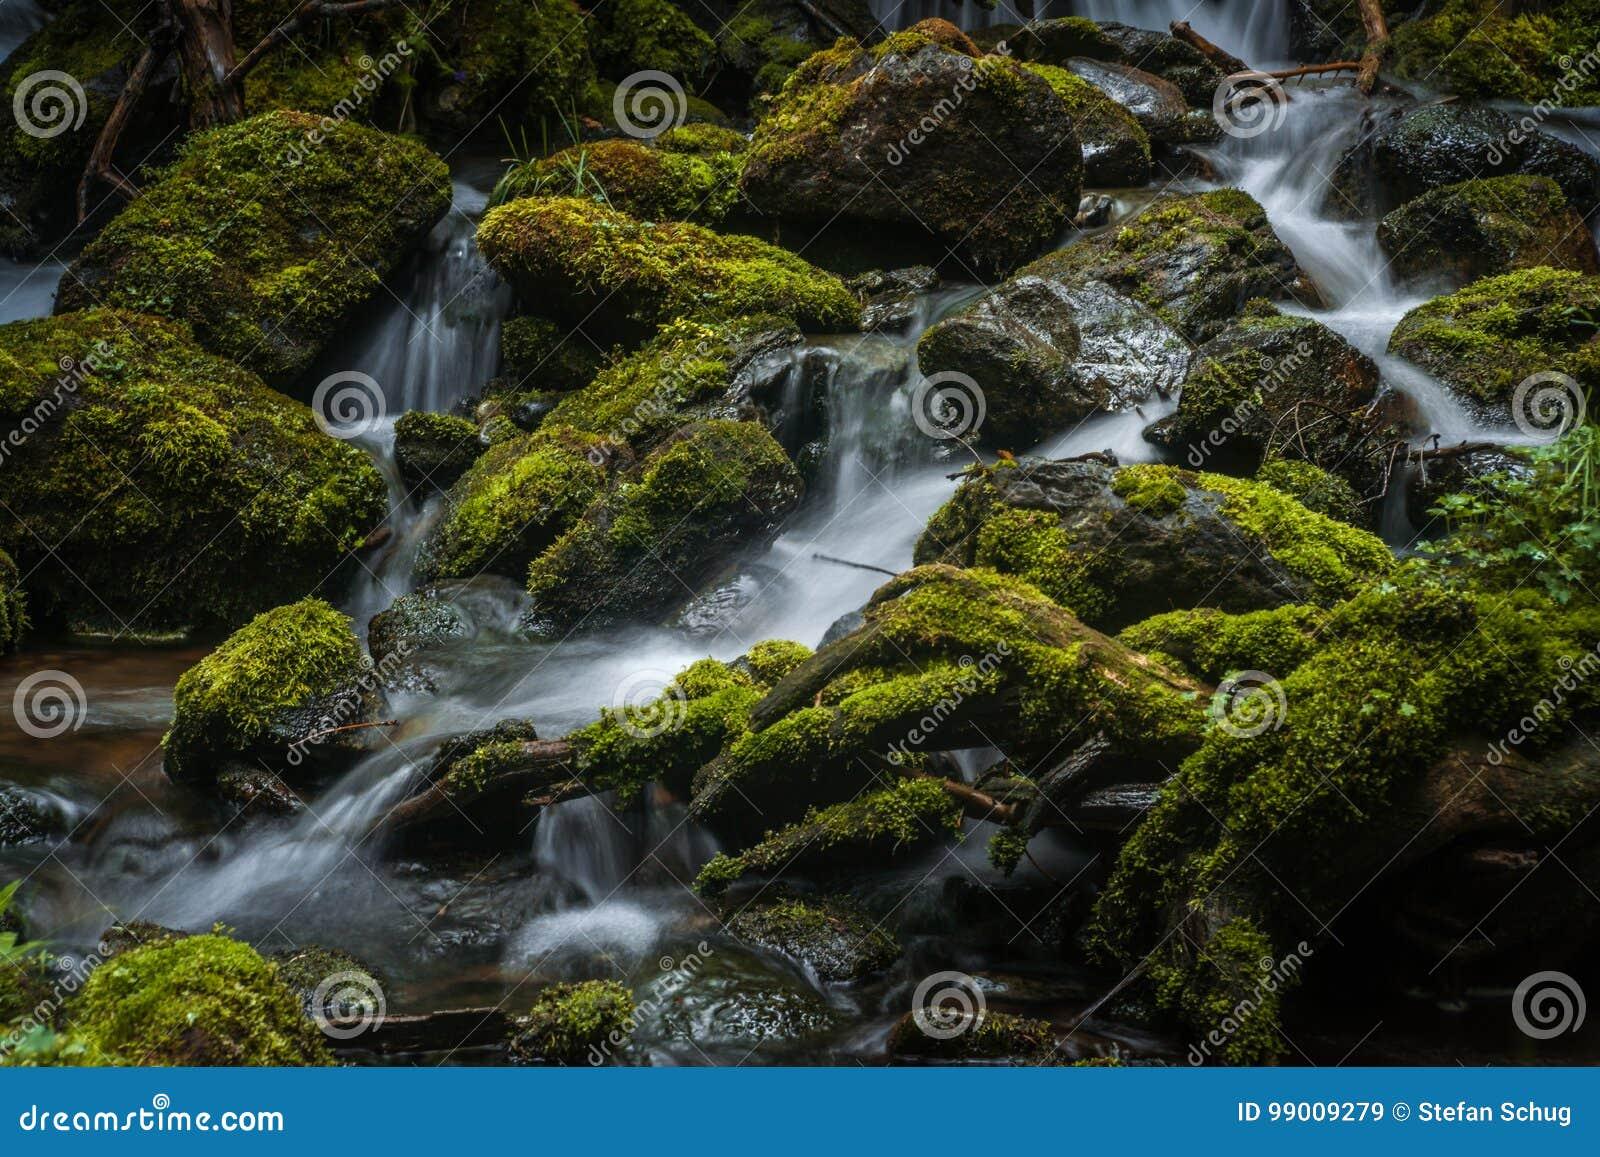 Cala cubierta de musgo